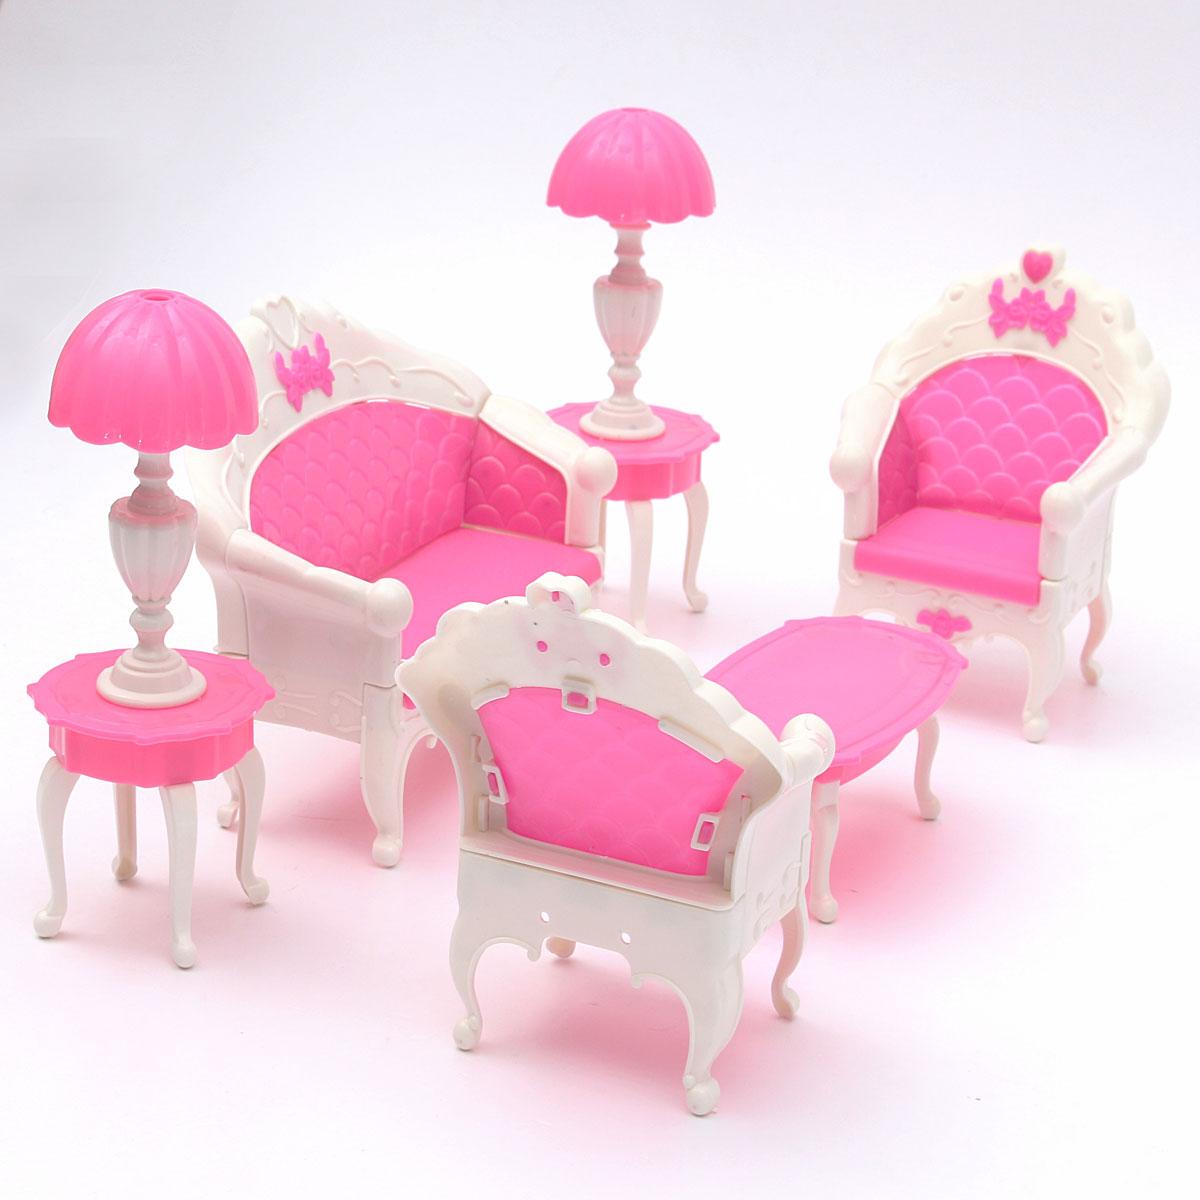 Doll House Furniture Sets